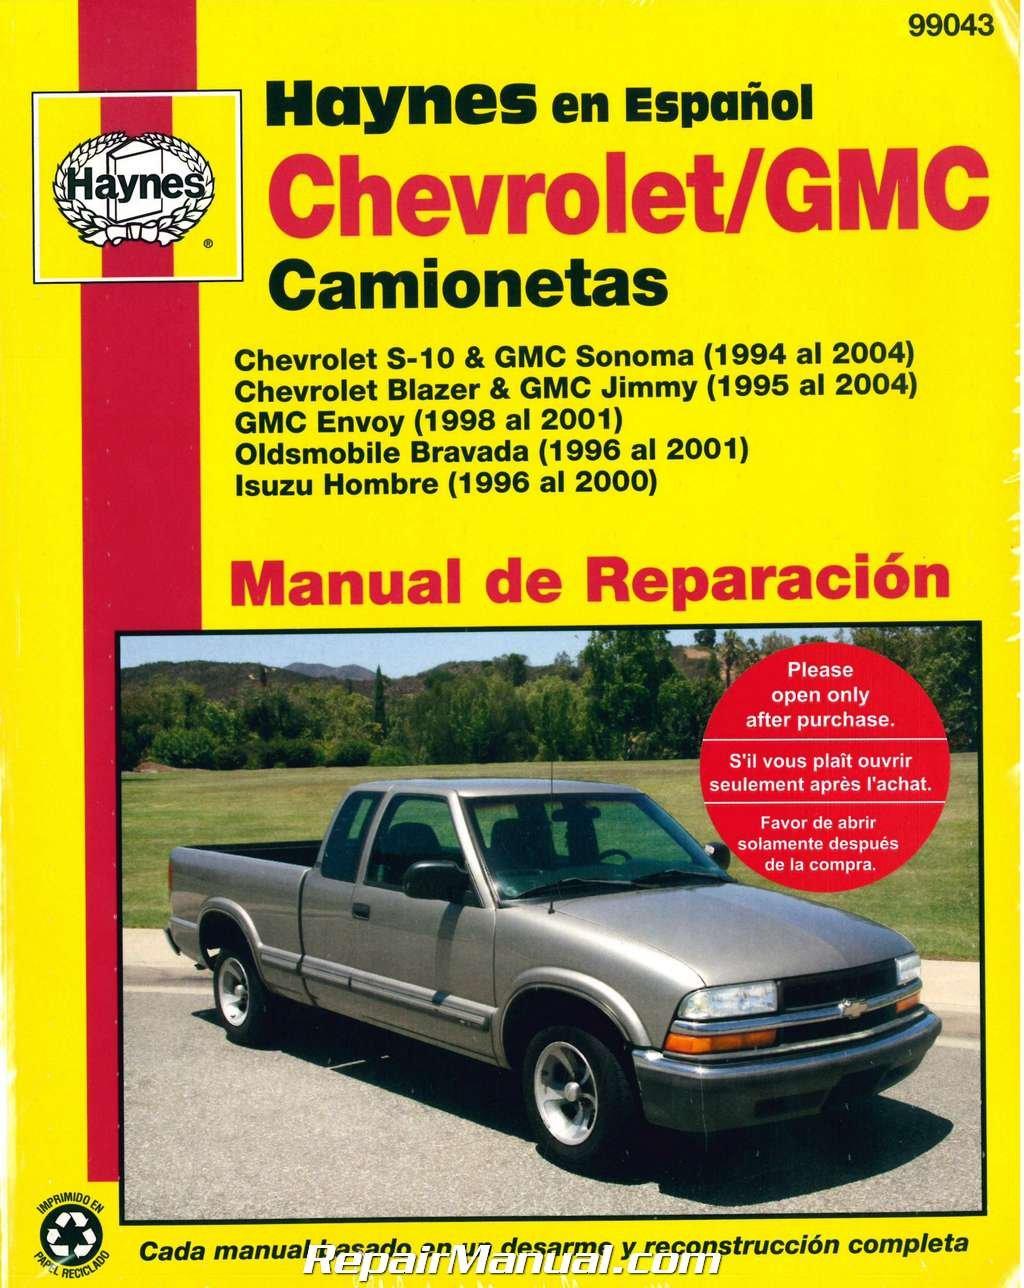 1996 isuzu hombre wiring diagram ee4a02 1998 isuzu hombre repair manuals fuse  wiring and manual  ee4a02 1998 isuzu hombre repair manuals